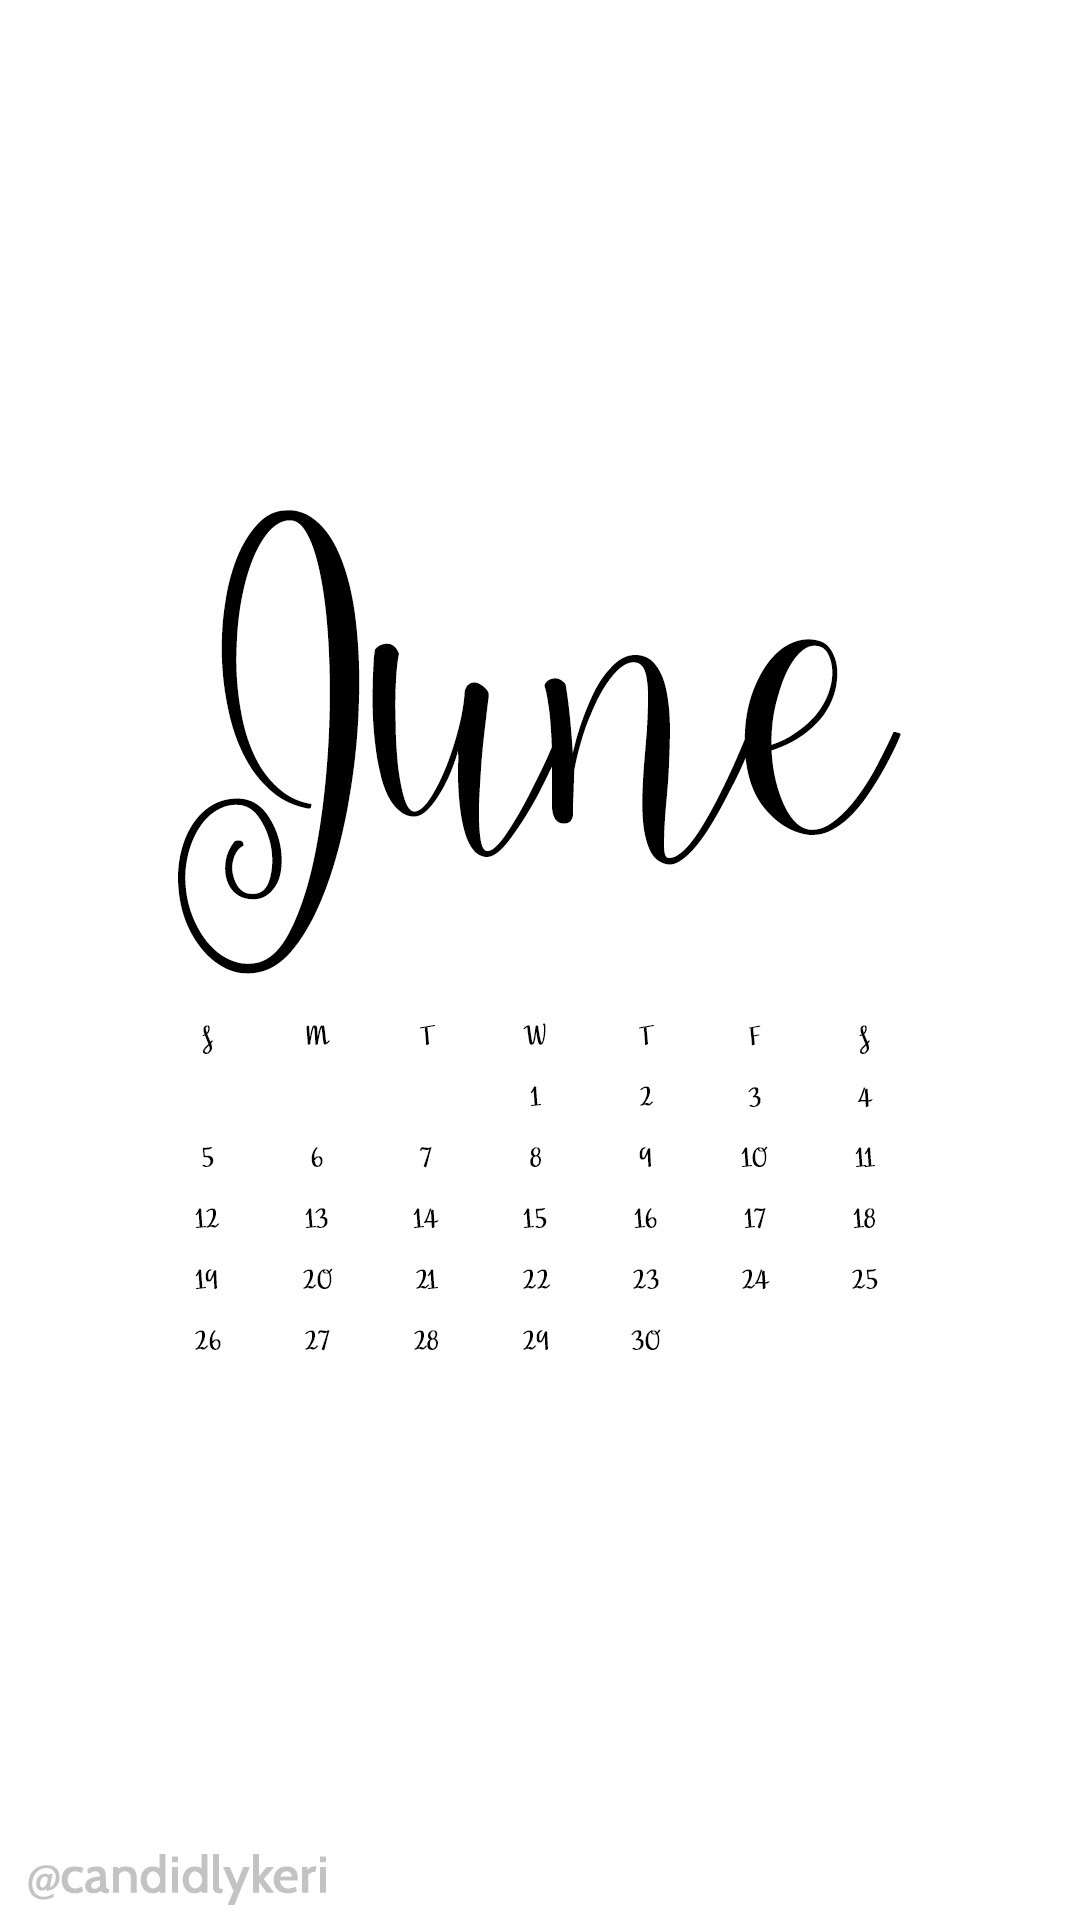 July 2018 Calendar Wallpapers 1